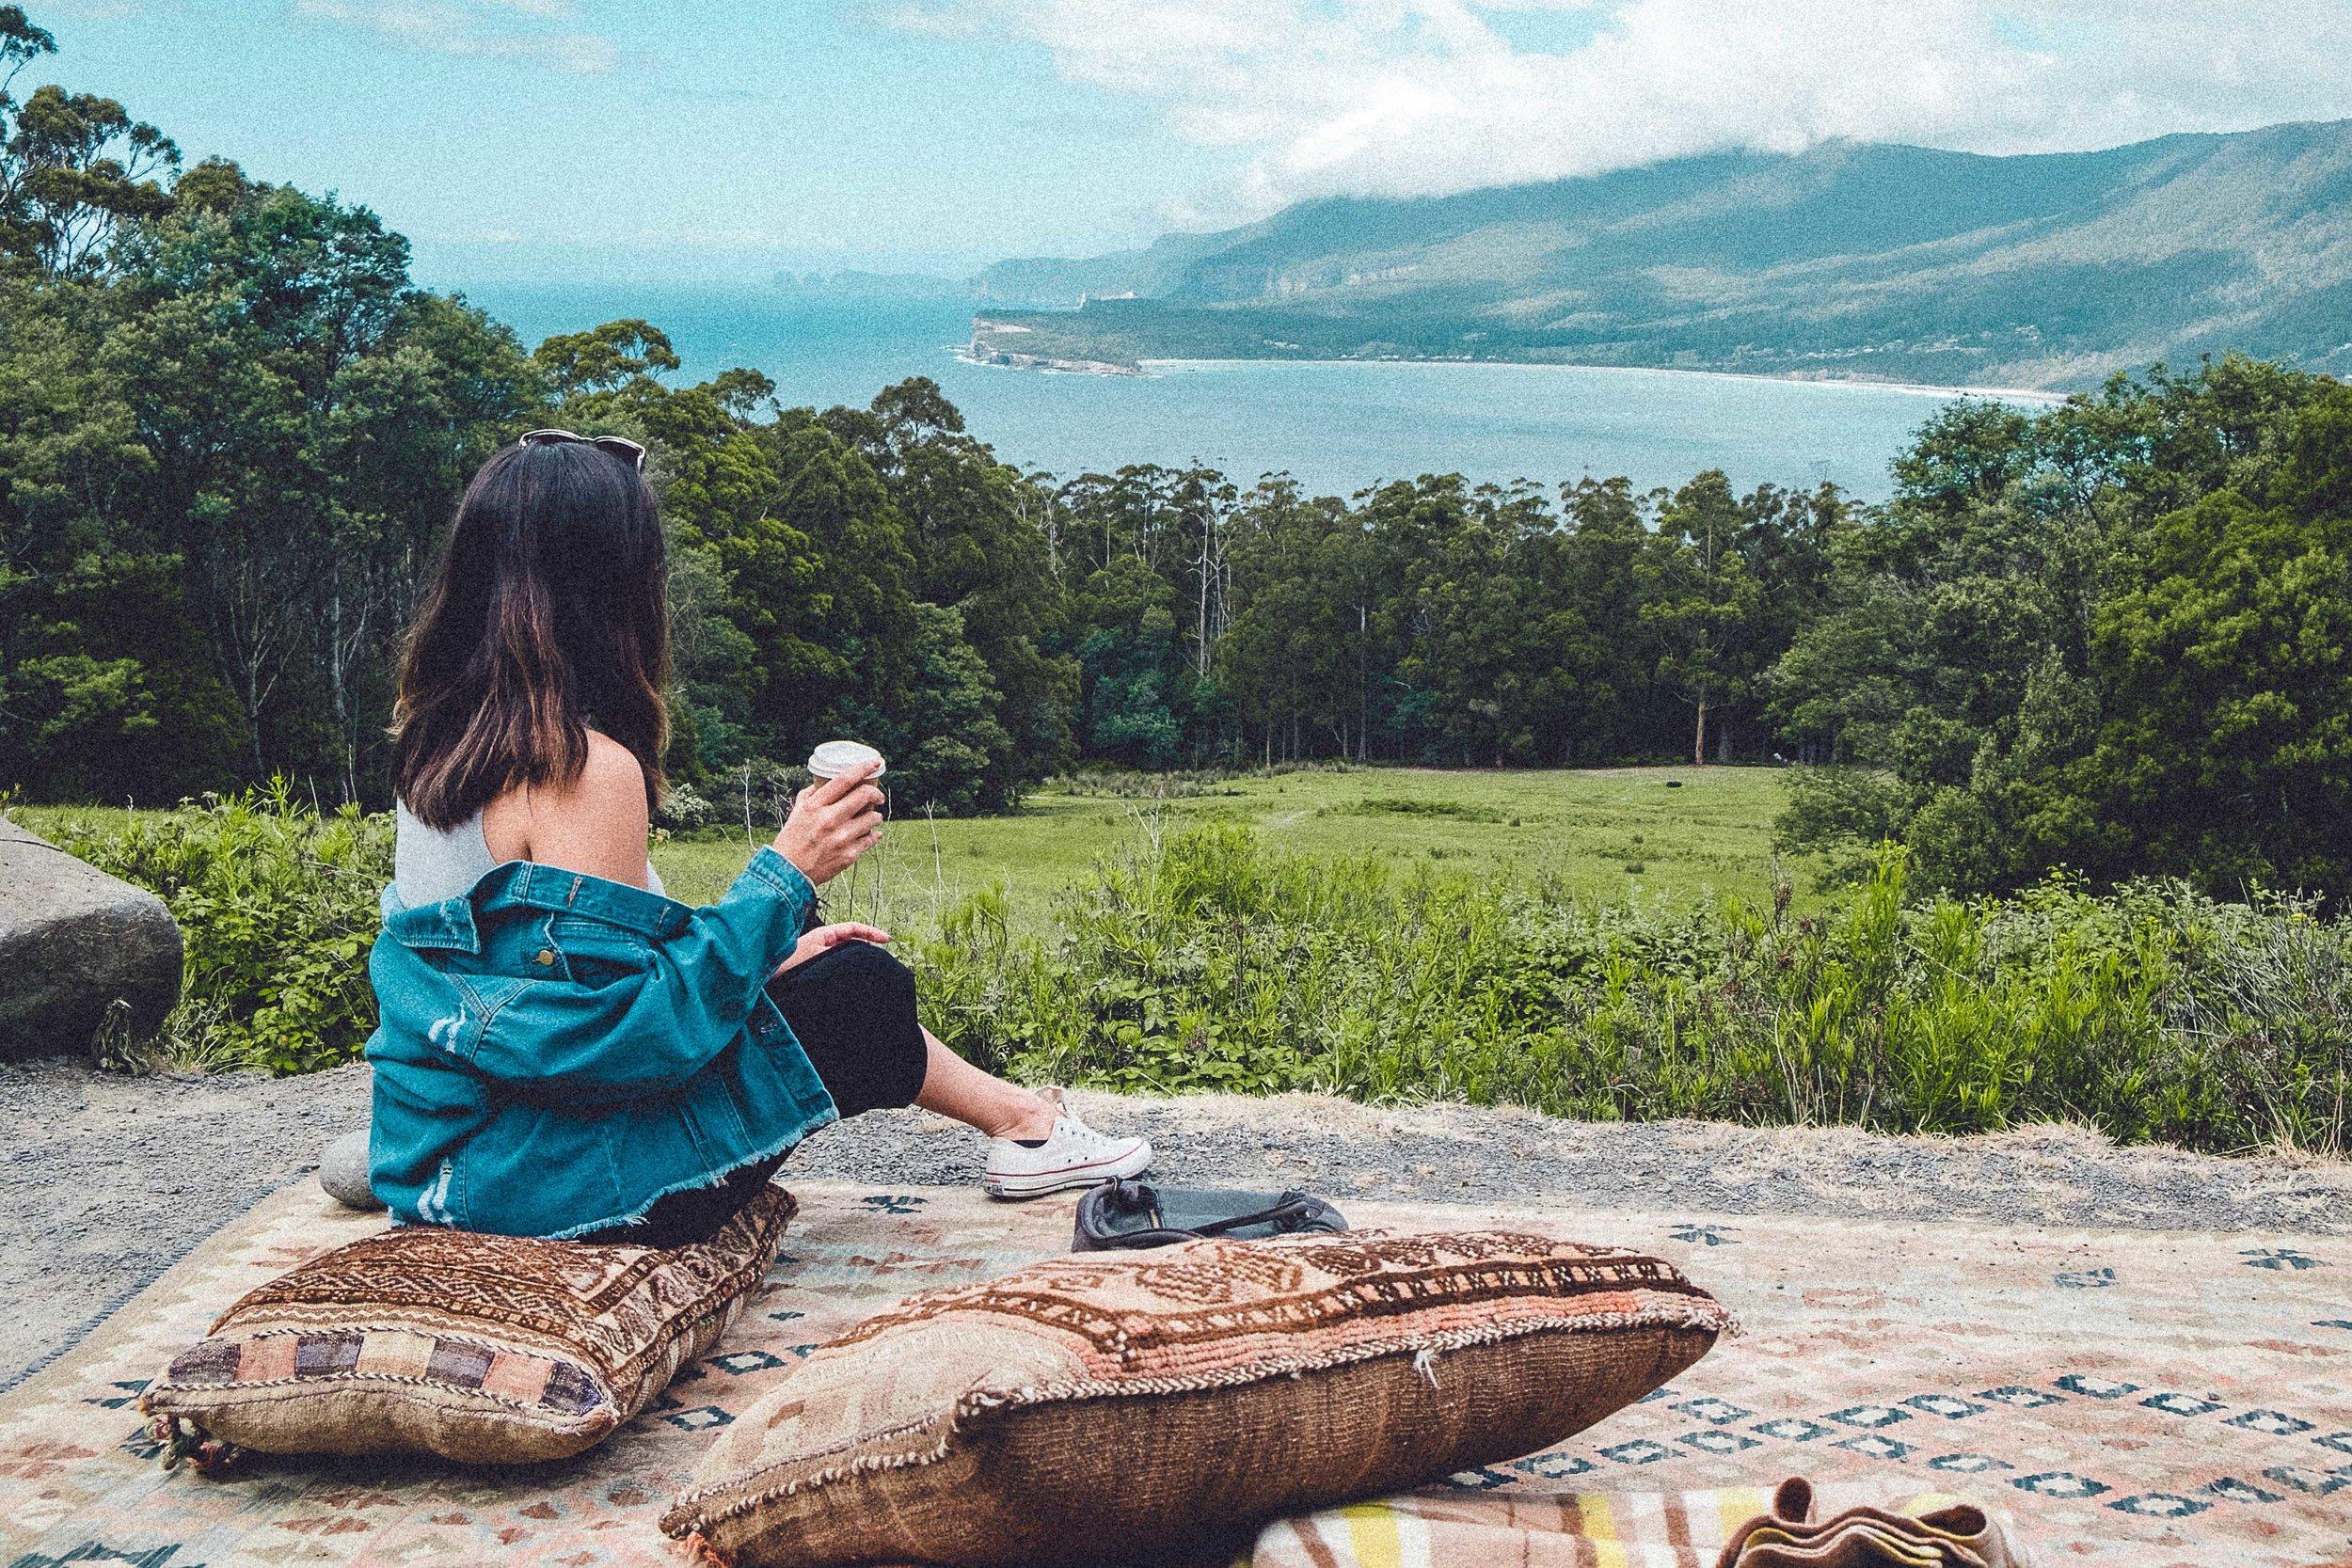 Rachel Off Duty: How to Spend 5 Days in Tasmania - Eaglehawk Neck